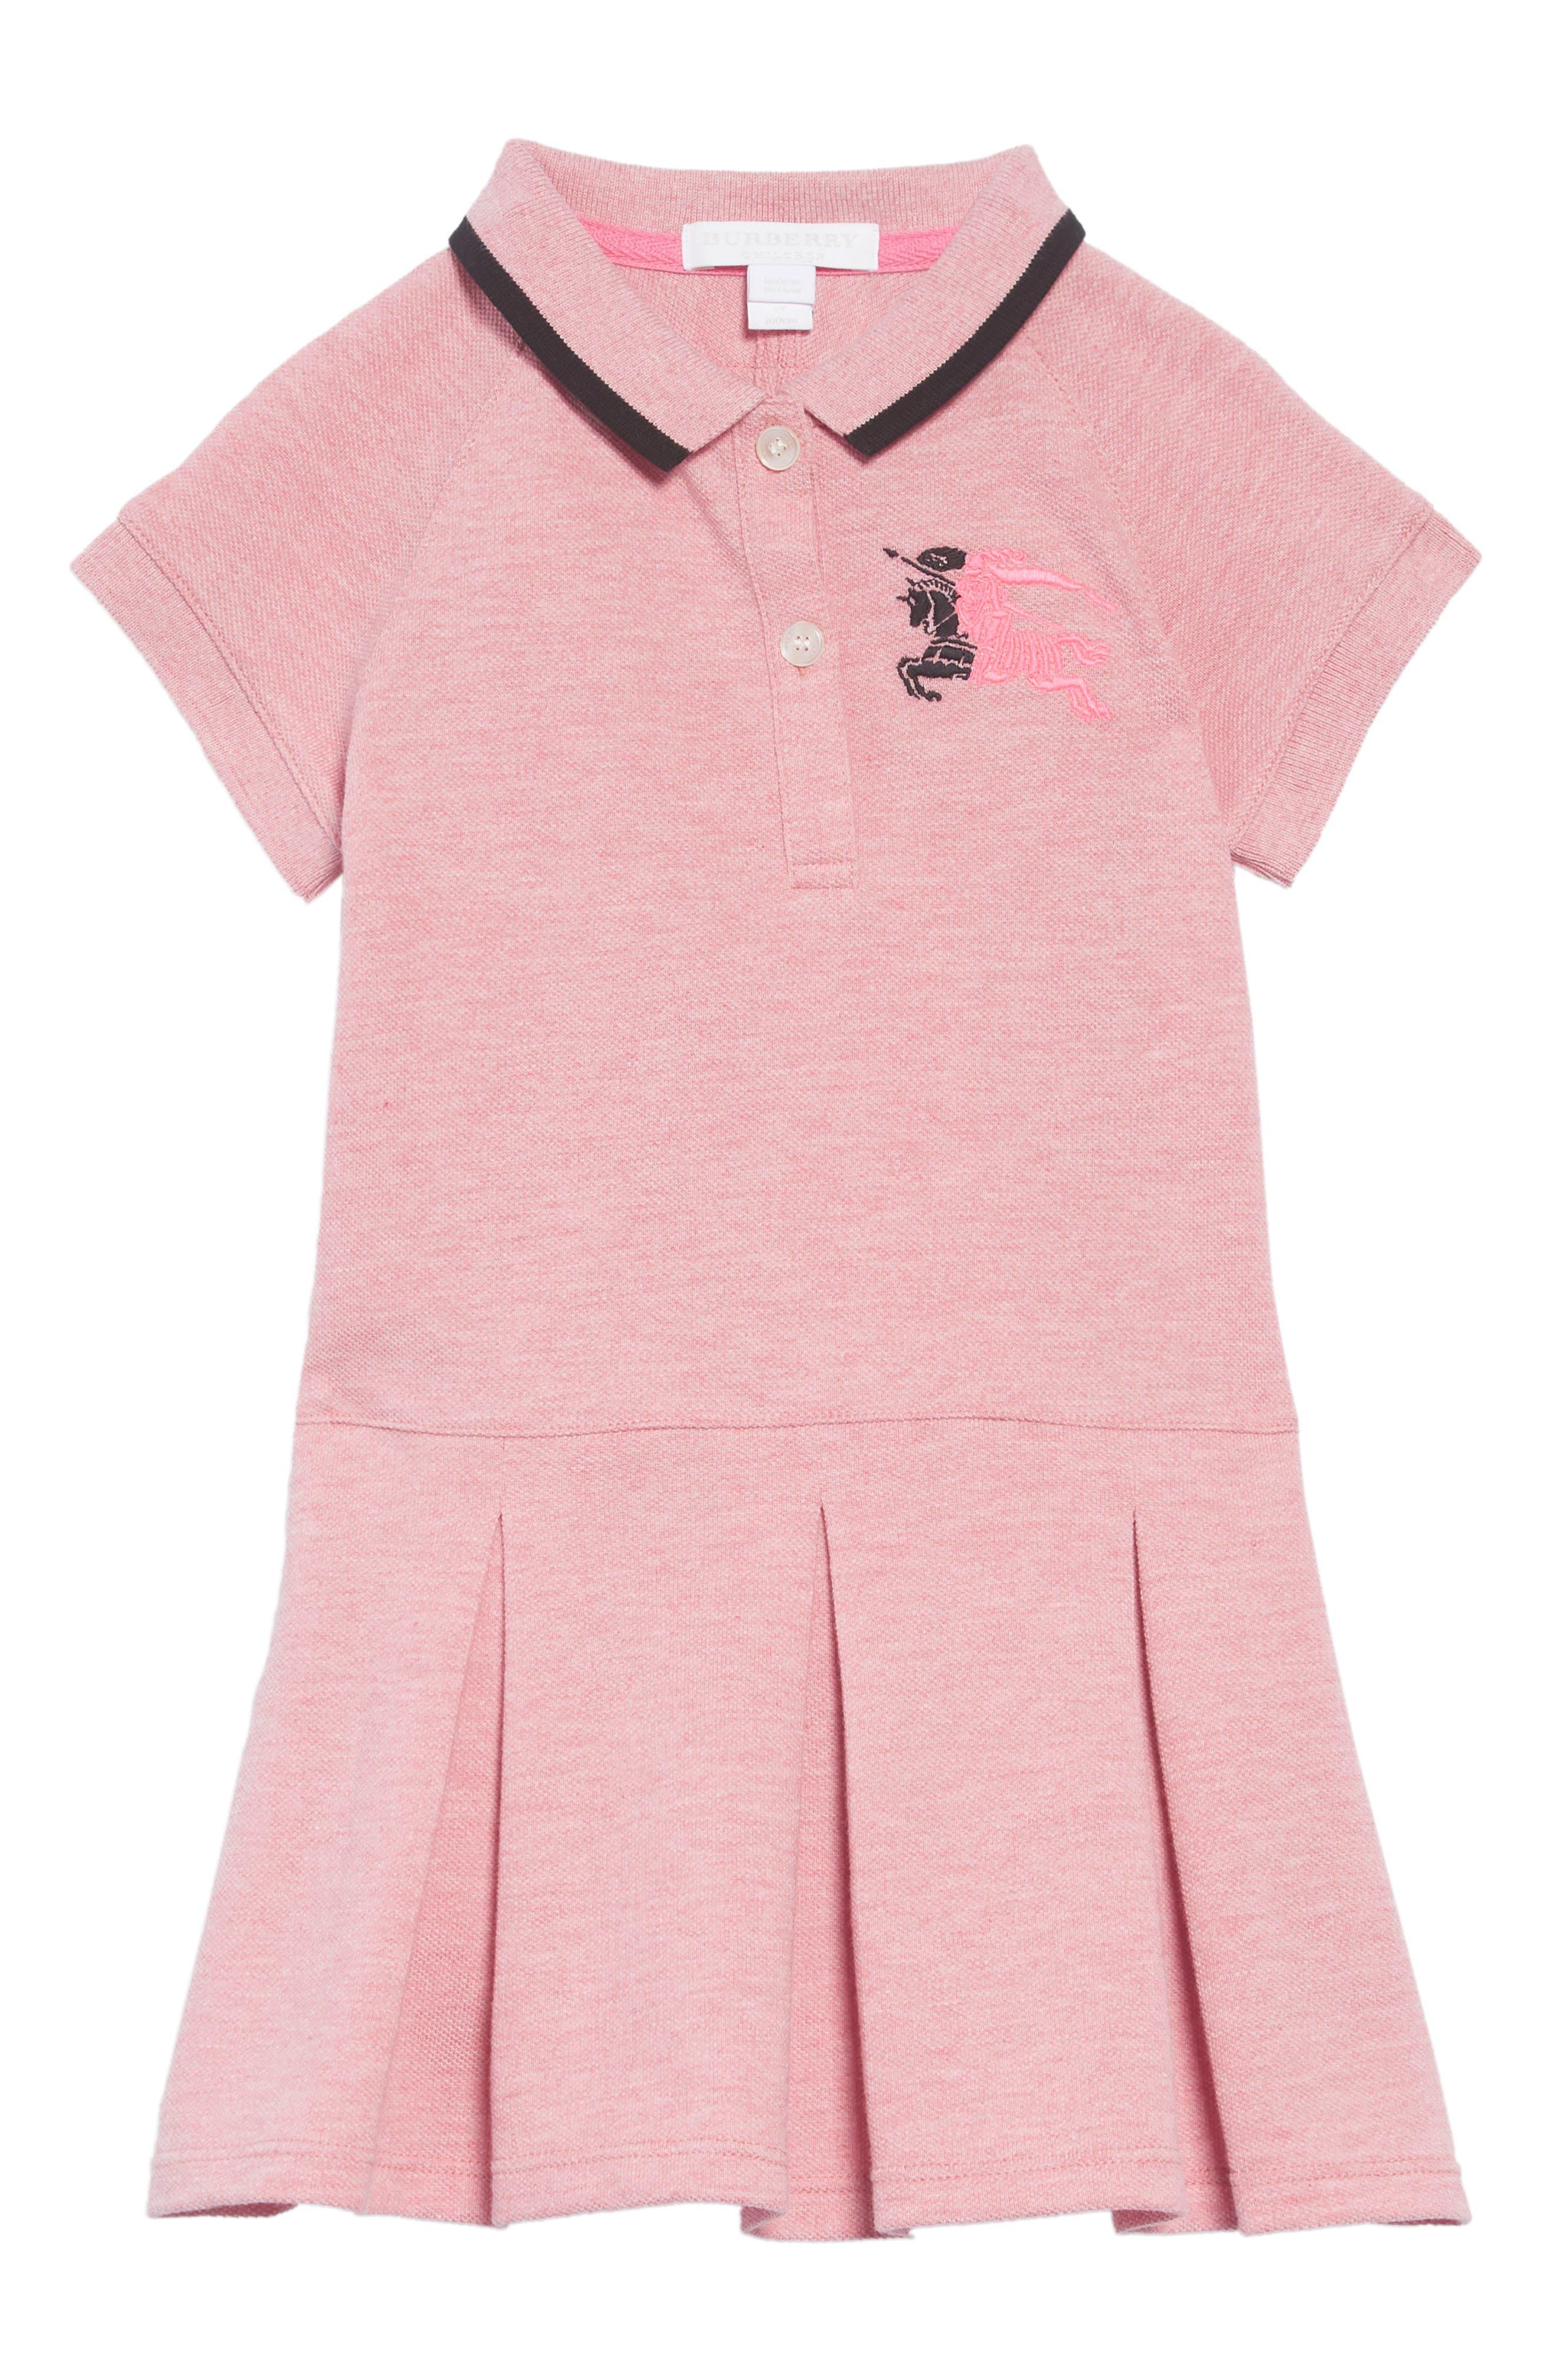 Mollyanna Polo Dress,                             Main thumbnail 1, color,                             PALE PINK MELANGE